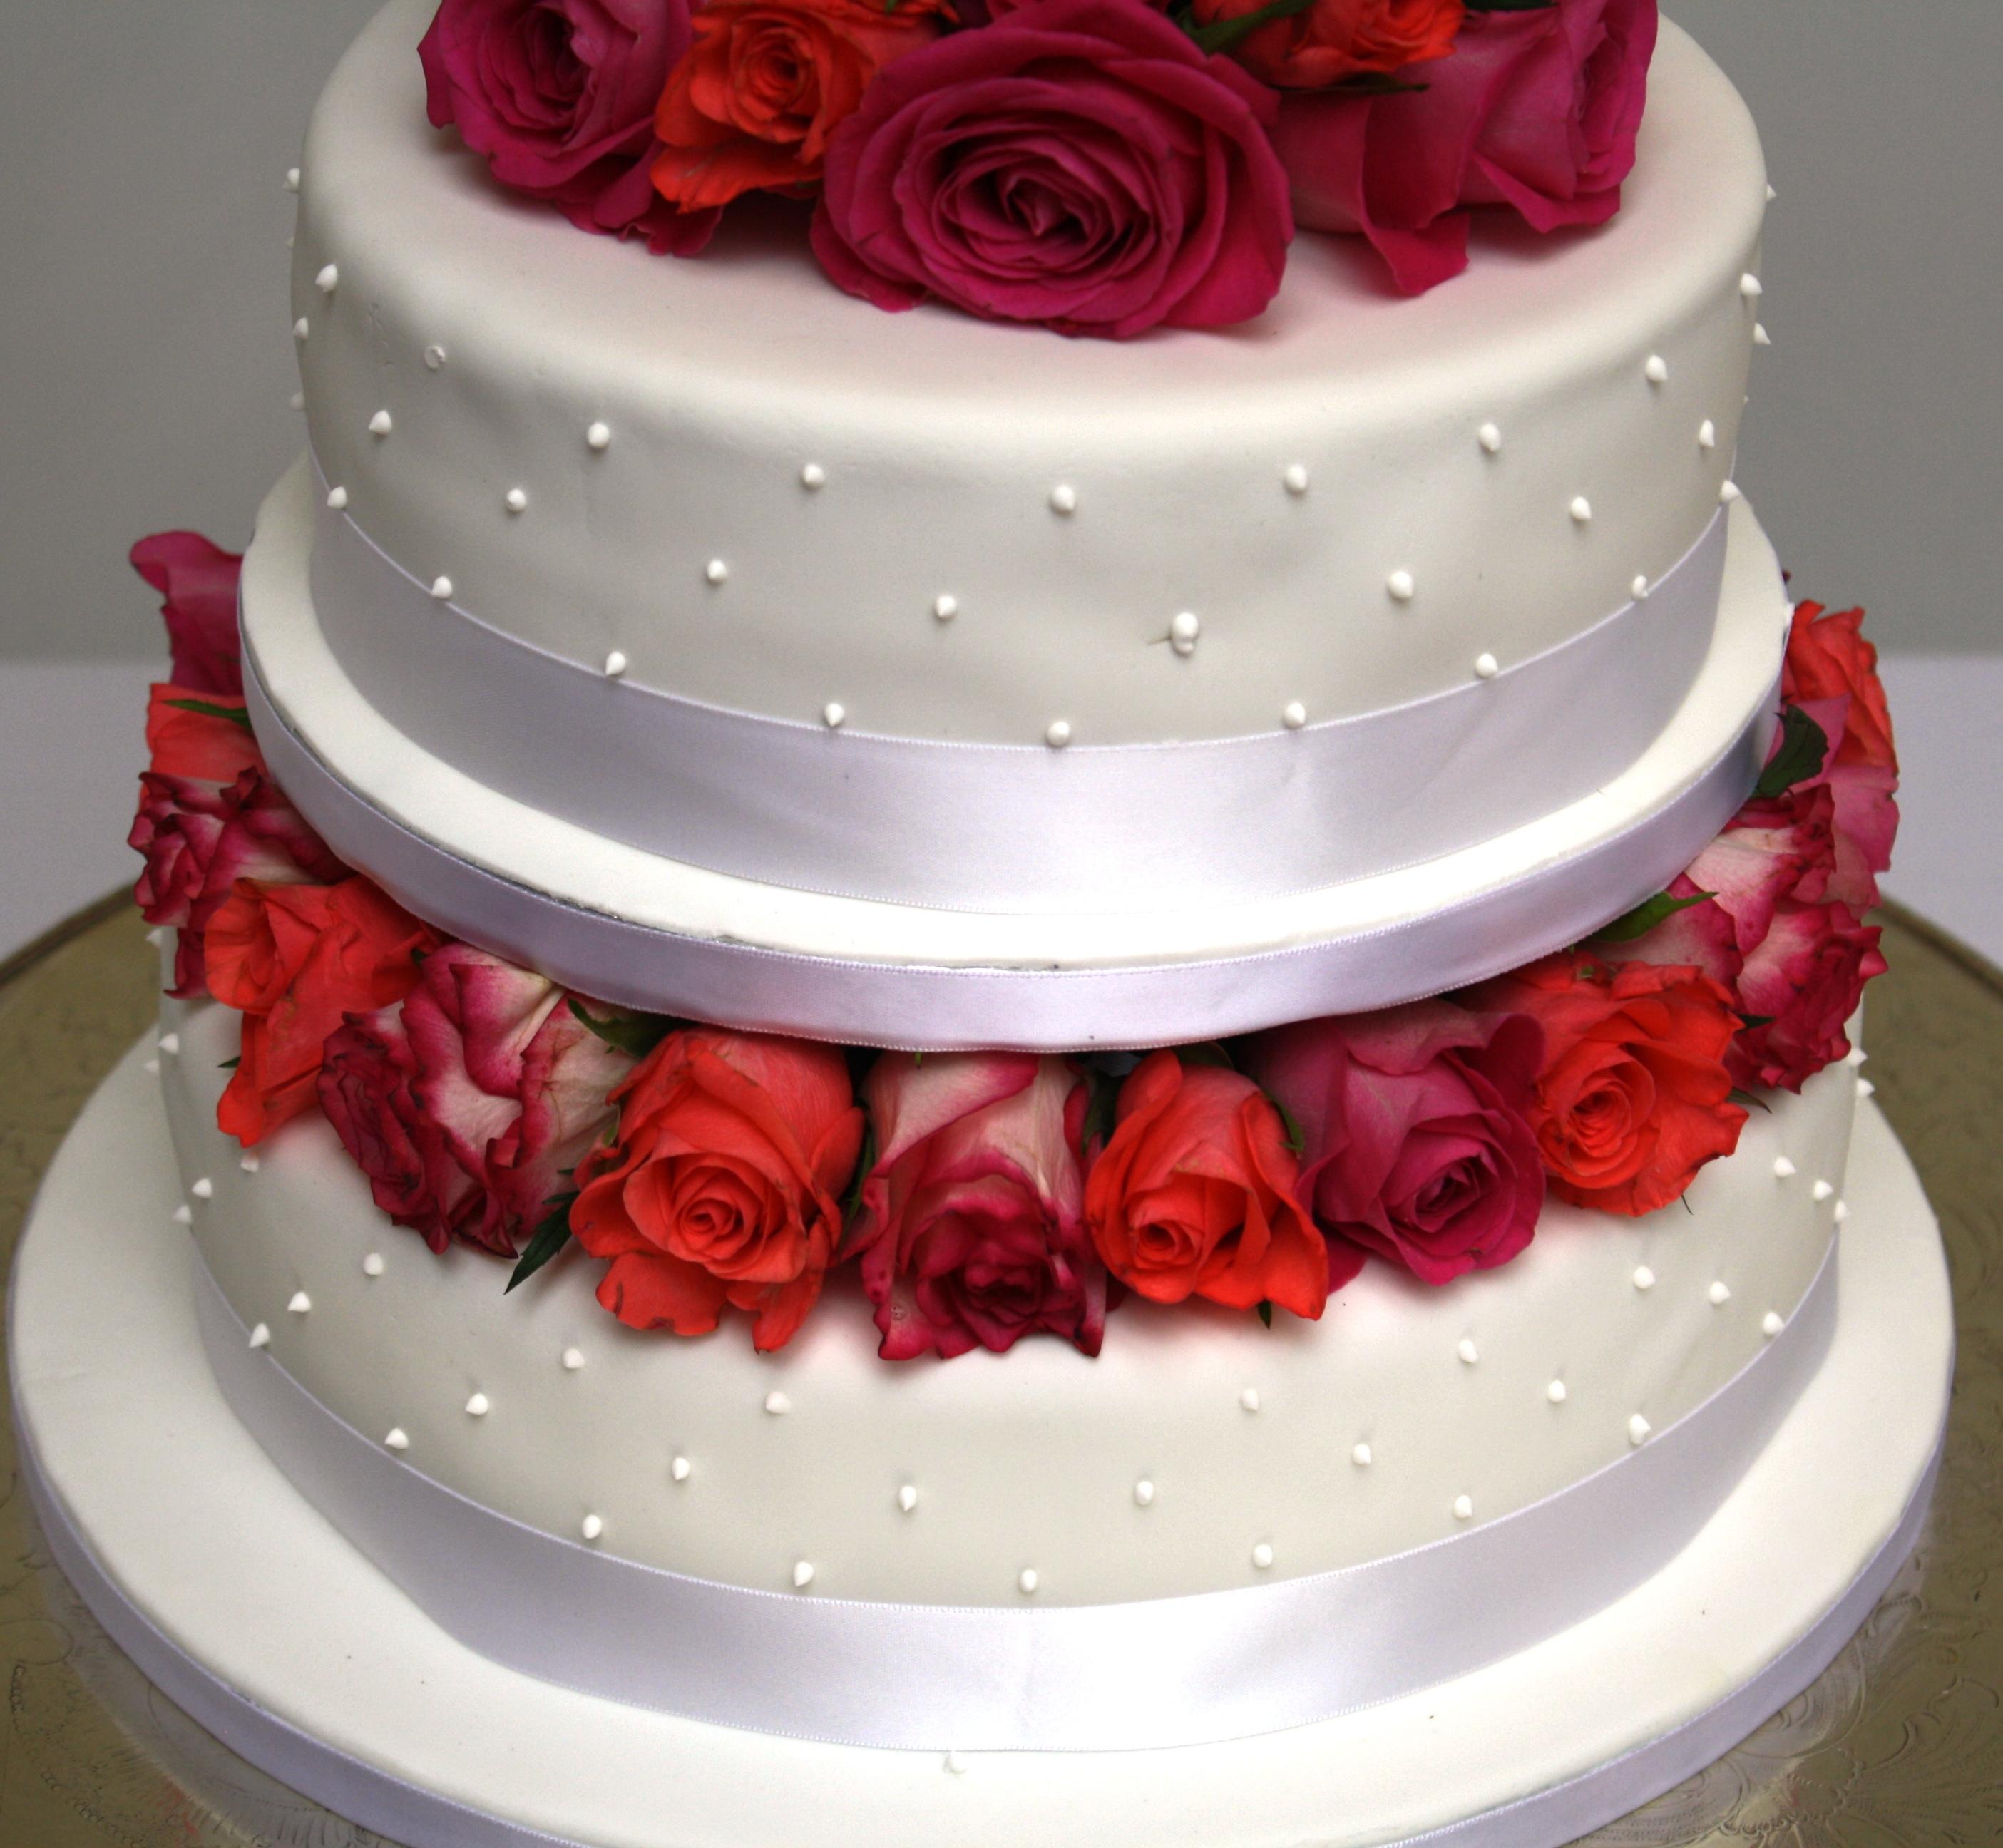 Rose and Polka Dot Wedding cake